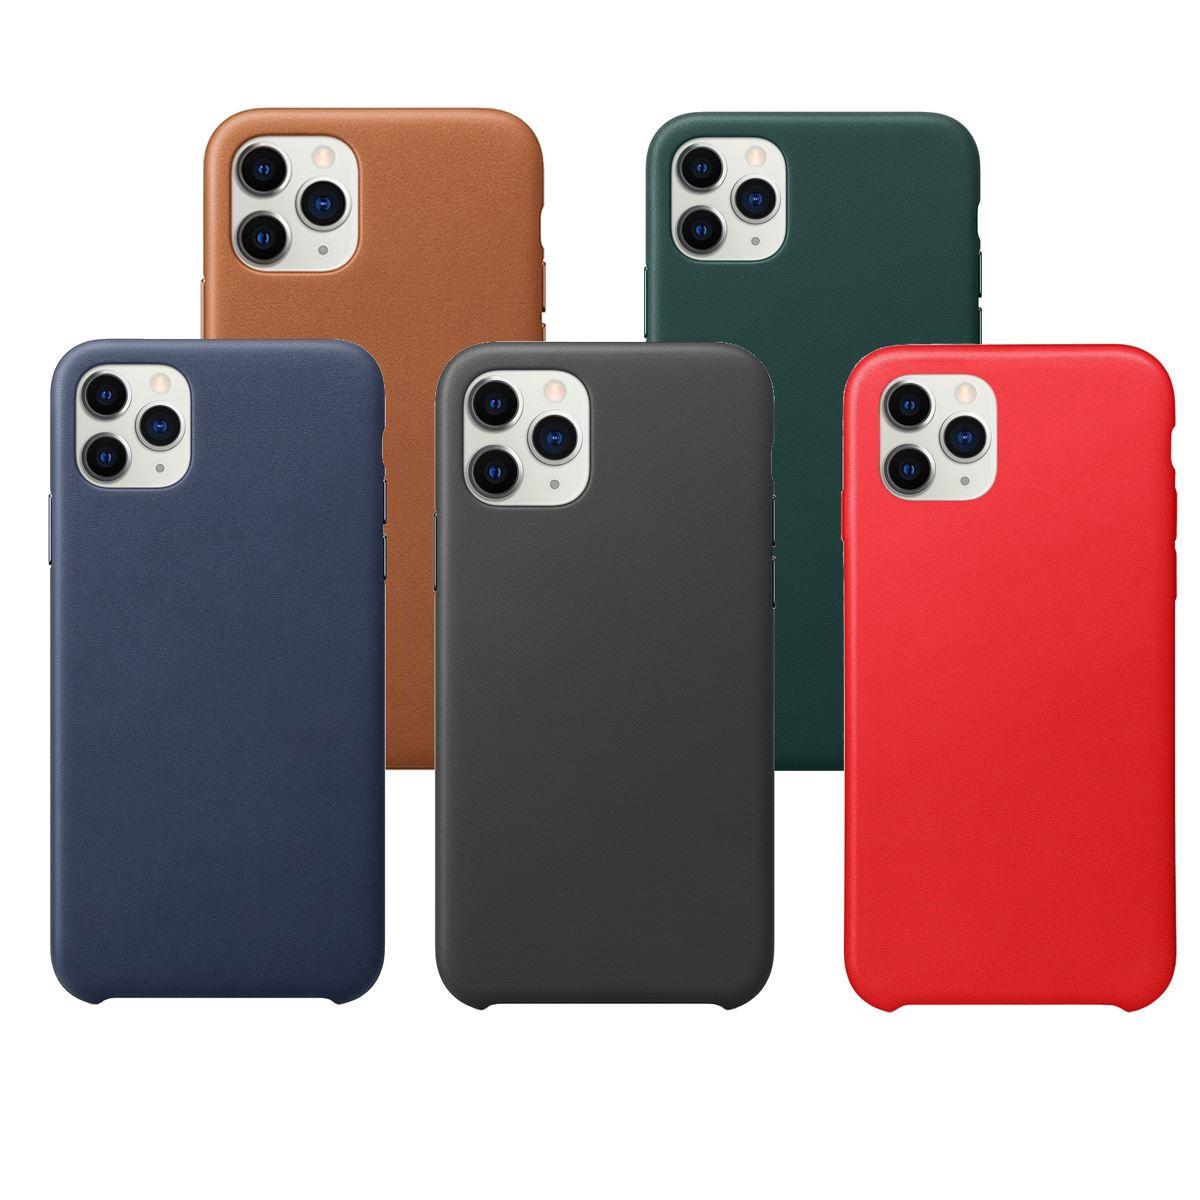 Leather-Slim-Case-Apple-iPhone-10-8-7-Plus-6s-5-Original-PU-Soft-Silicone-Cover thumbnail 9